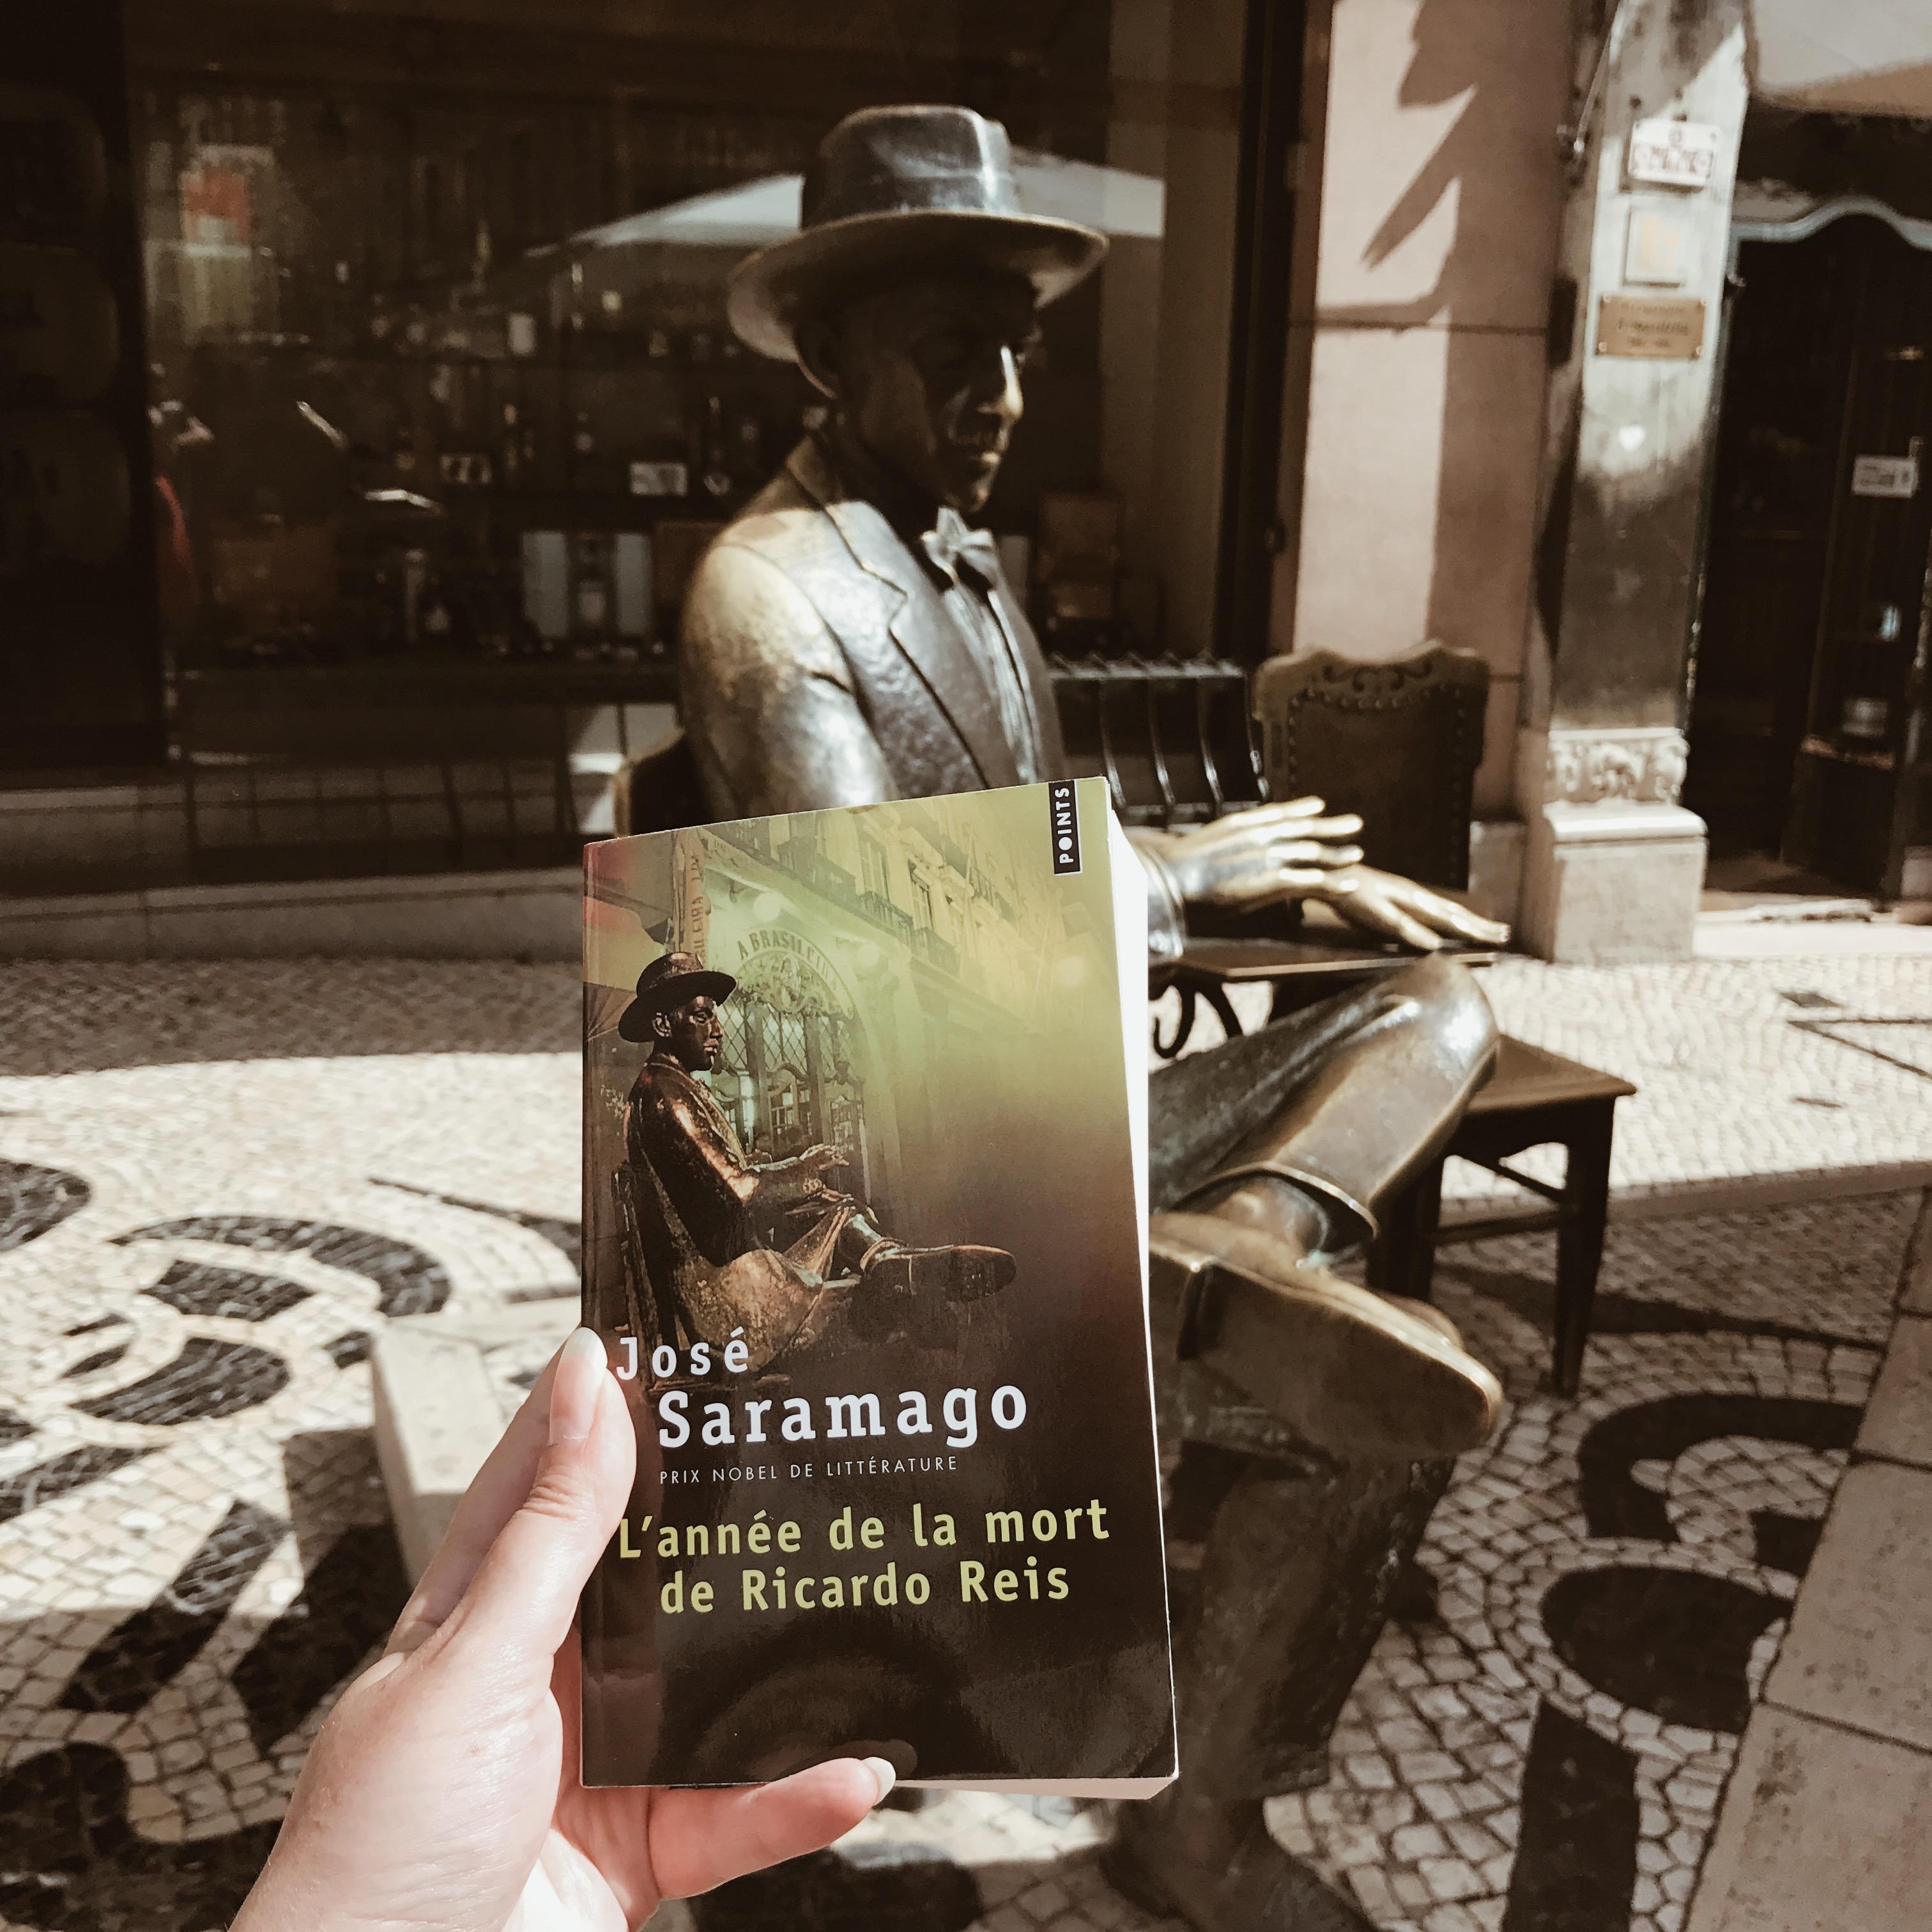 L'année de la mort de Ricardo Reis, de José Saramago